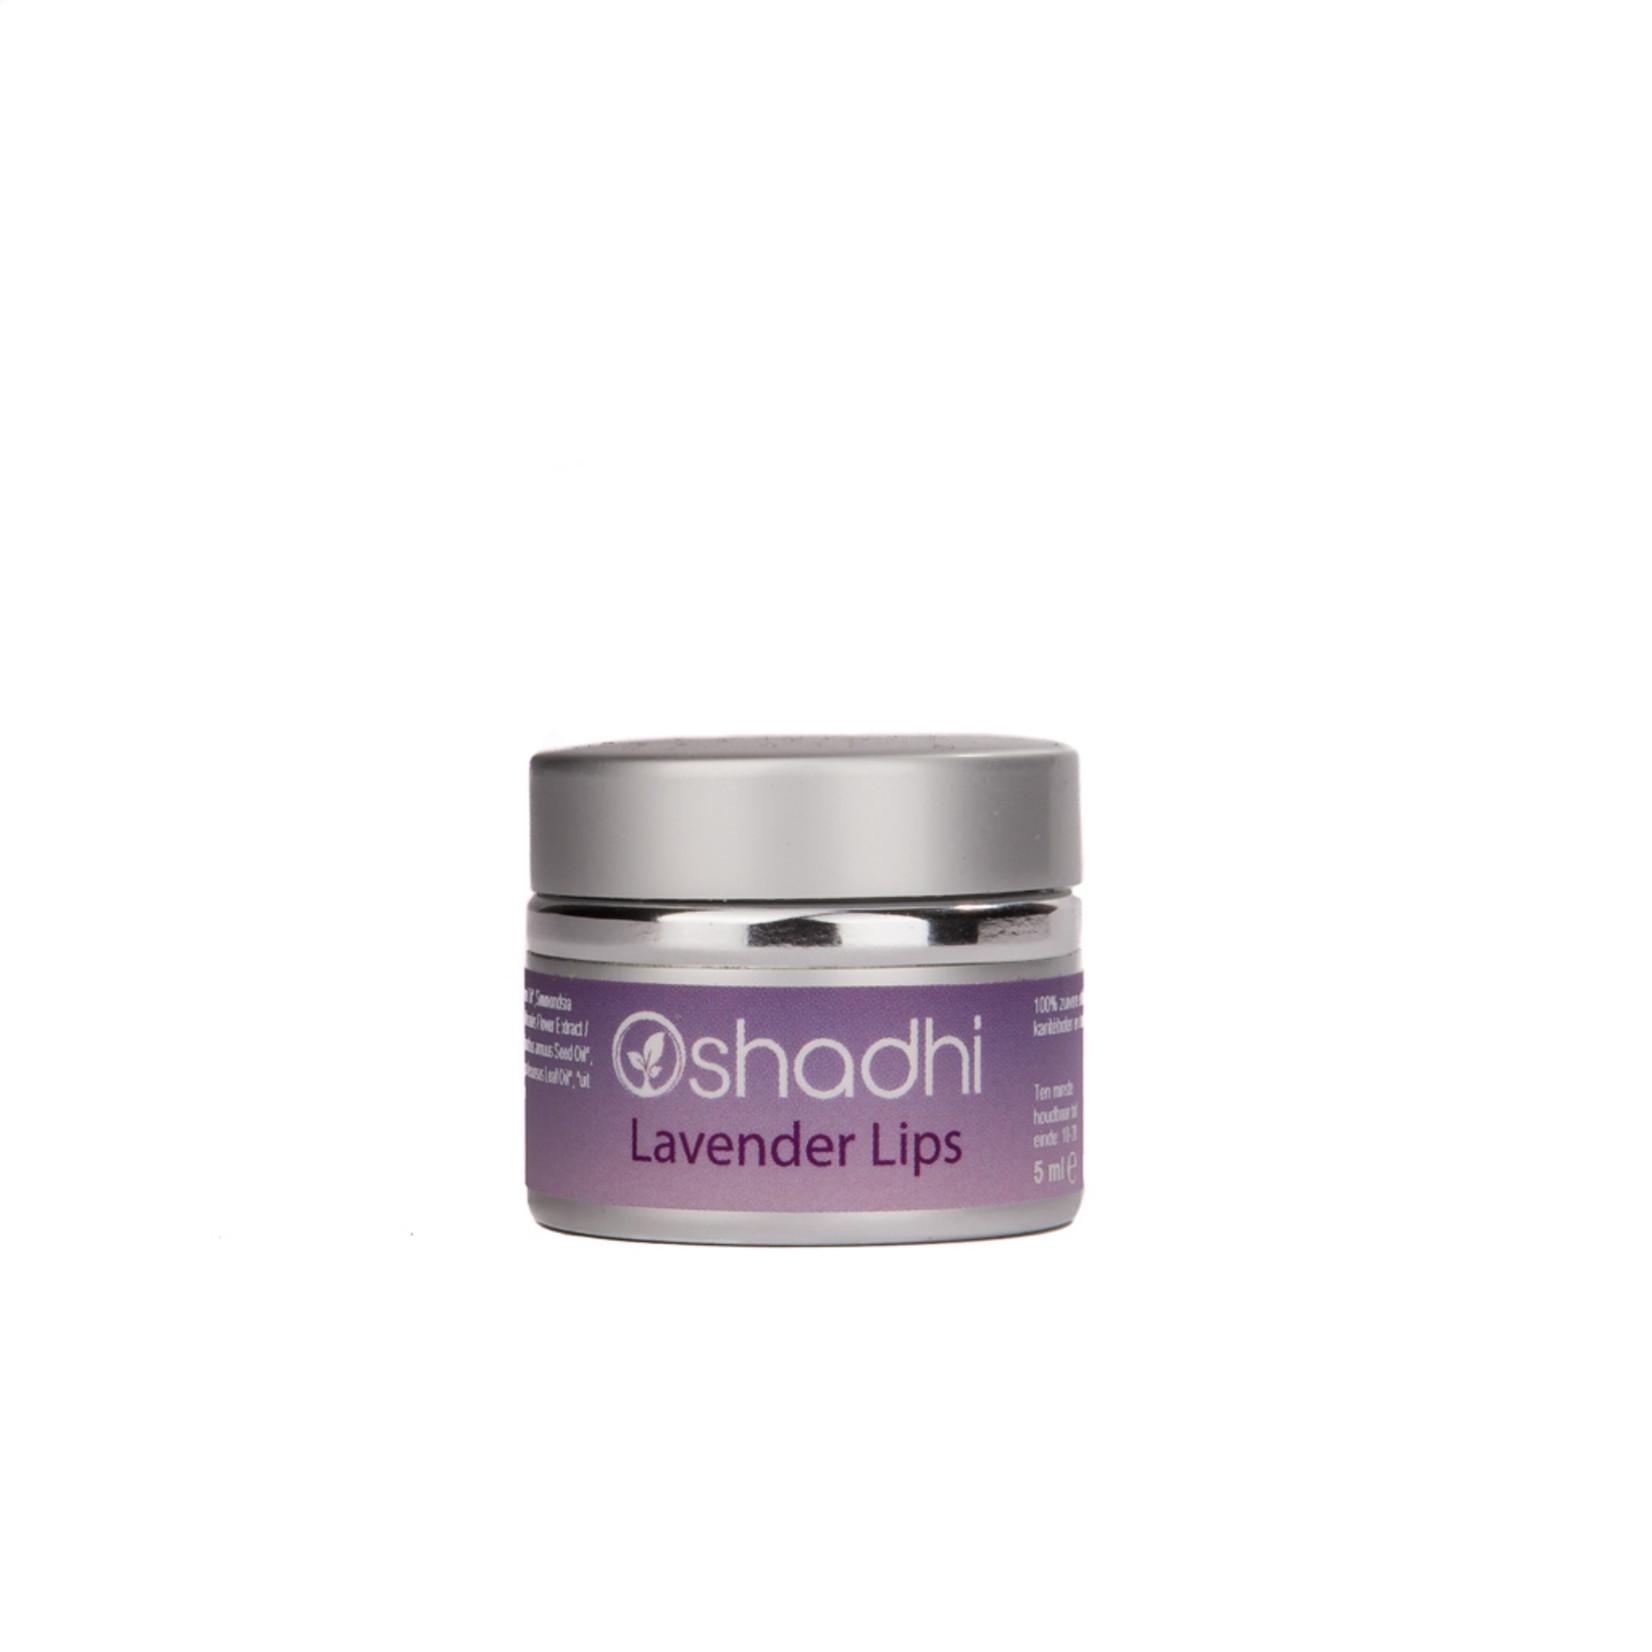 Oshadhi Lippenbalsem Lavender Lips Oshadhi - zalige lippenbalsem BIO